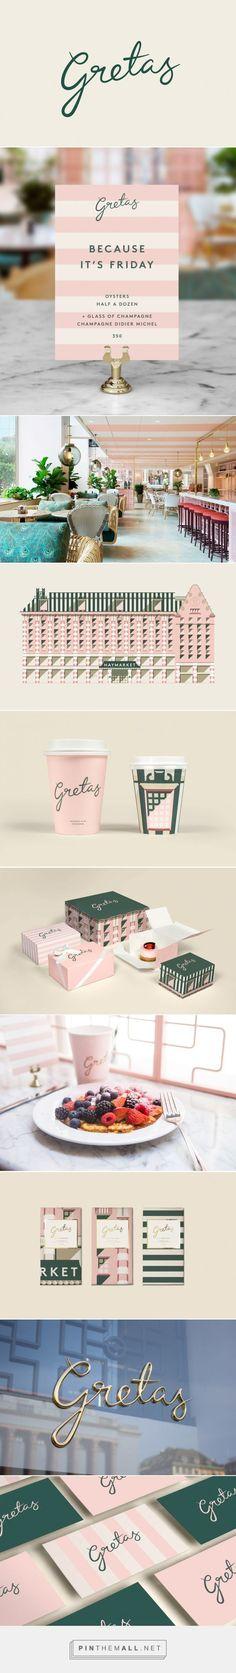 Gretas Cafe Branding by Café Branding, Restaurant Branding, Business Branding, Restaurant Design, Business Card Design, Web Design, Cafe Design, Retro Design, Packaging Design Inspiration